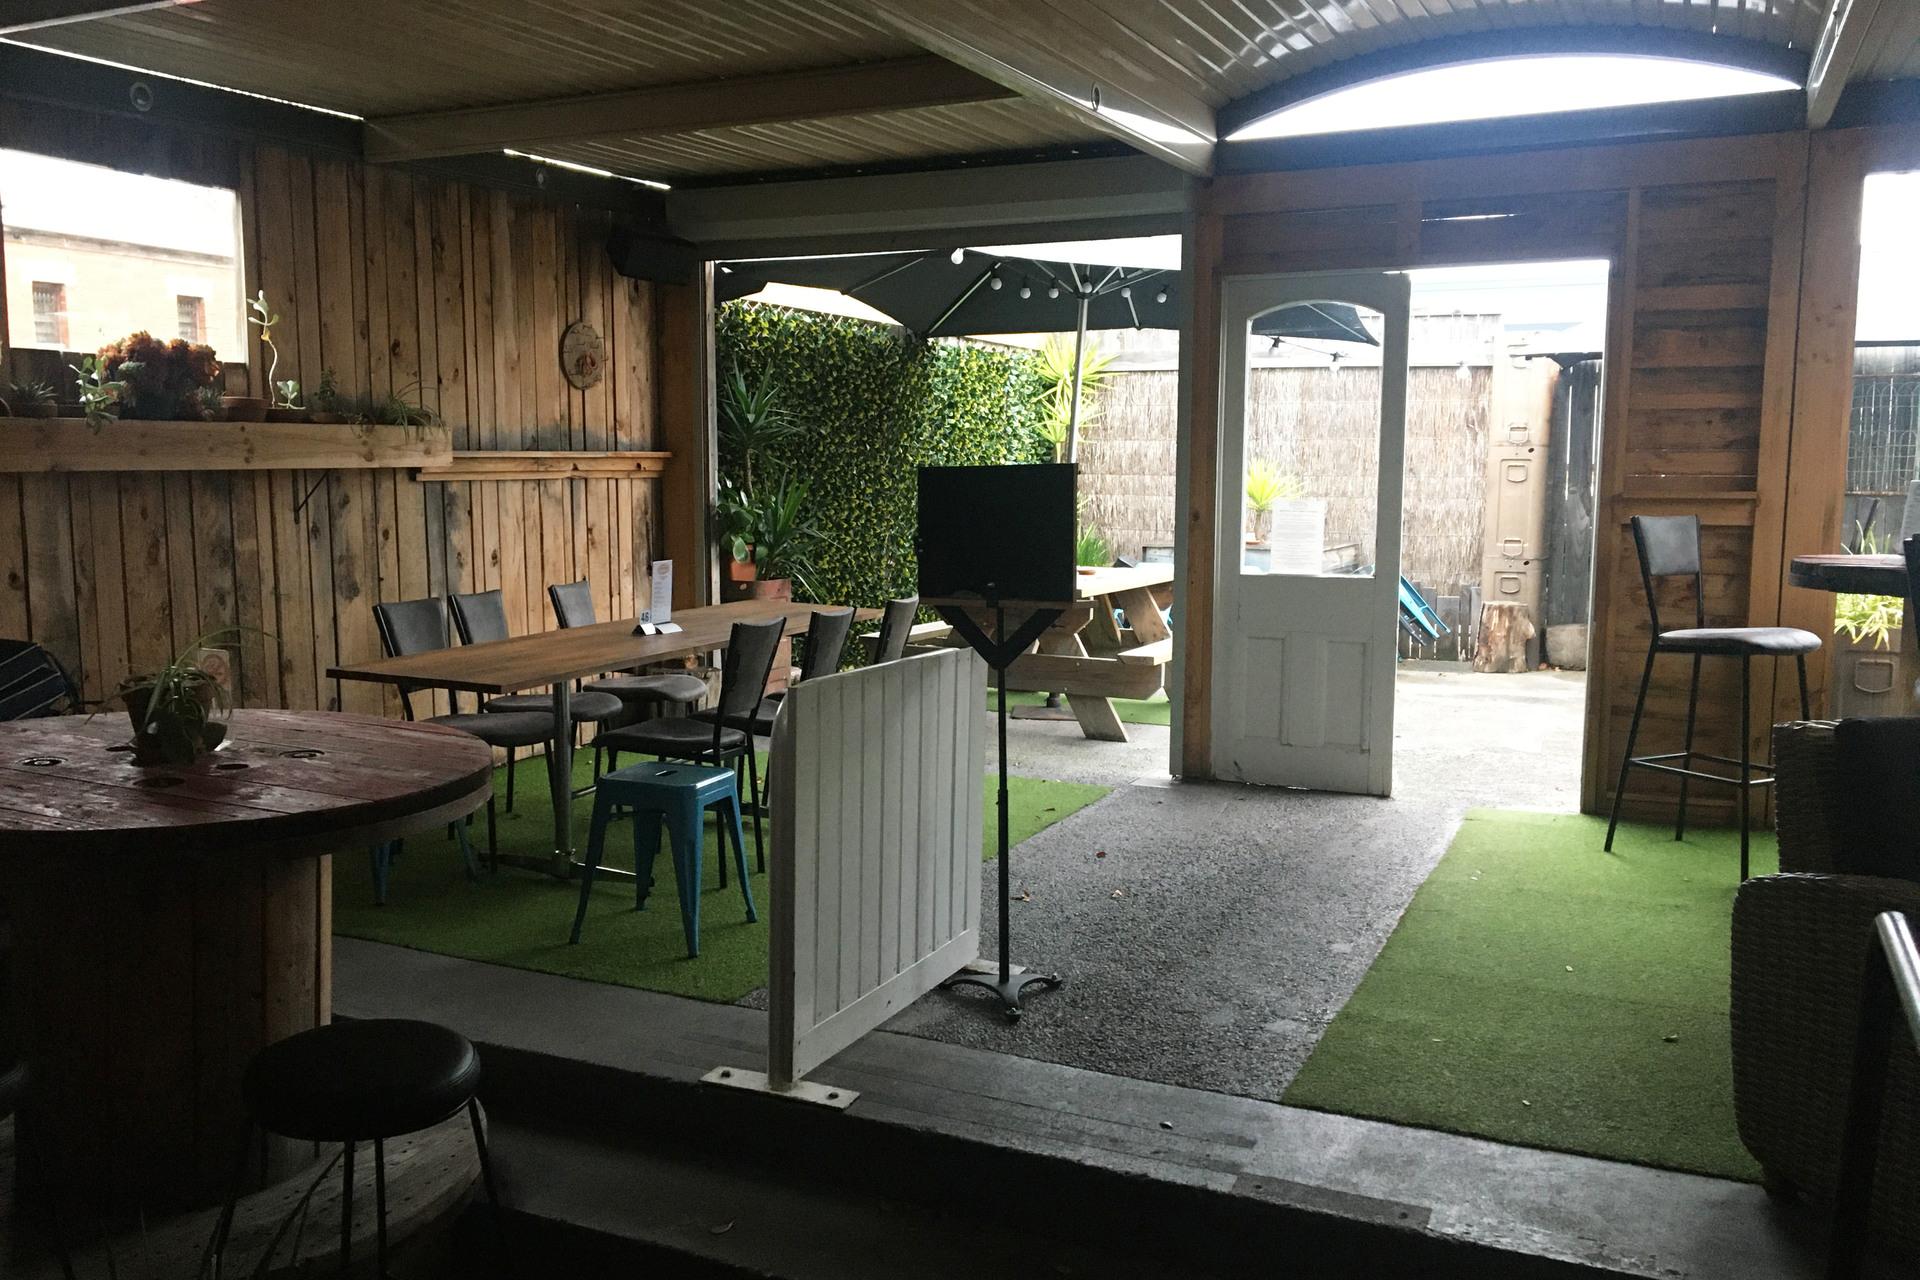 b - Culture Cafe Lounge Bar